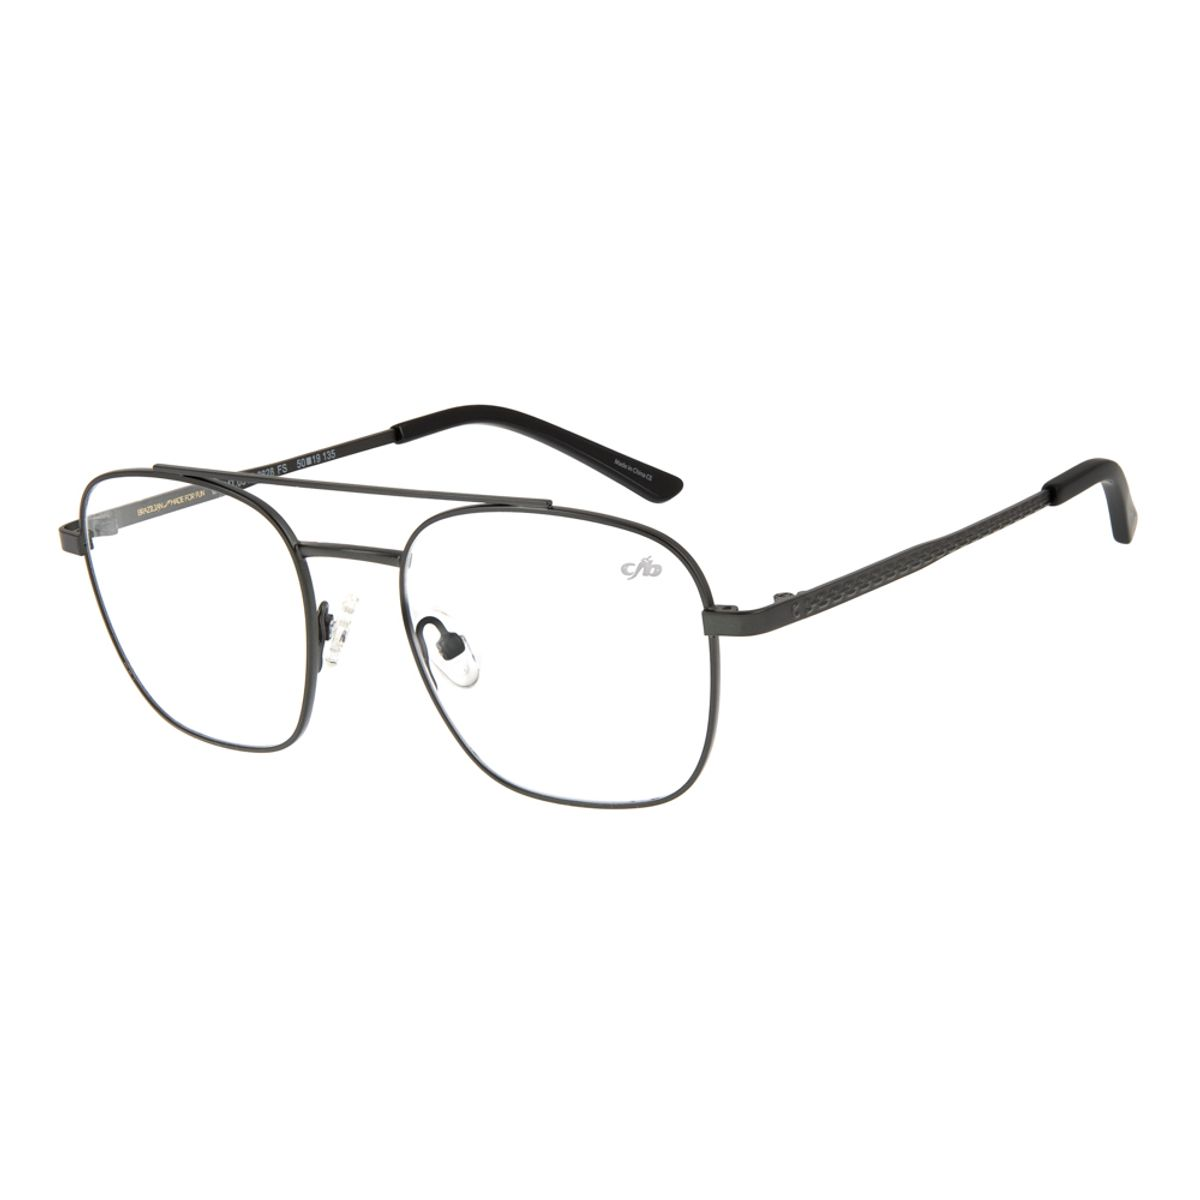 3152bd44d Armação para Óculos de Grau Unissex Chilli Beans Blk Metal Cinza ...